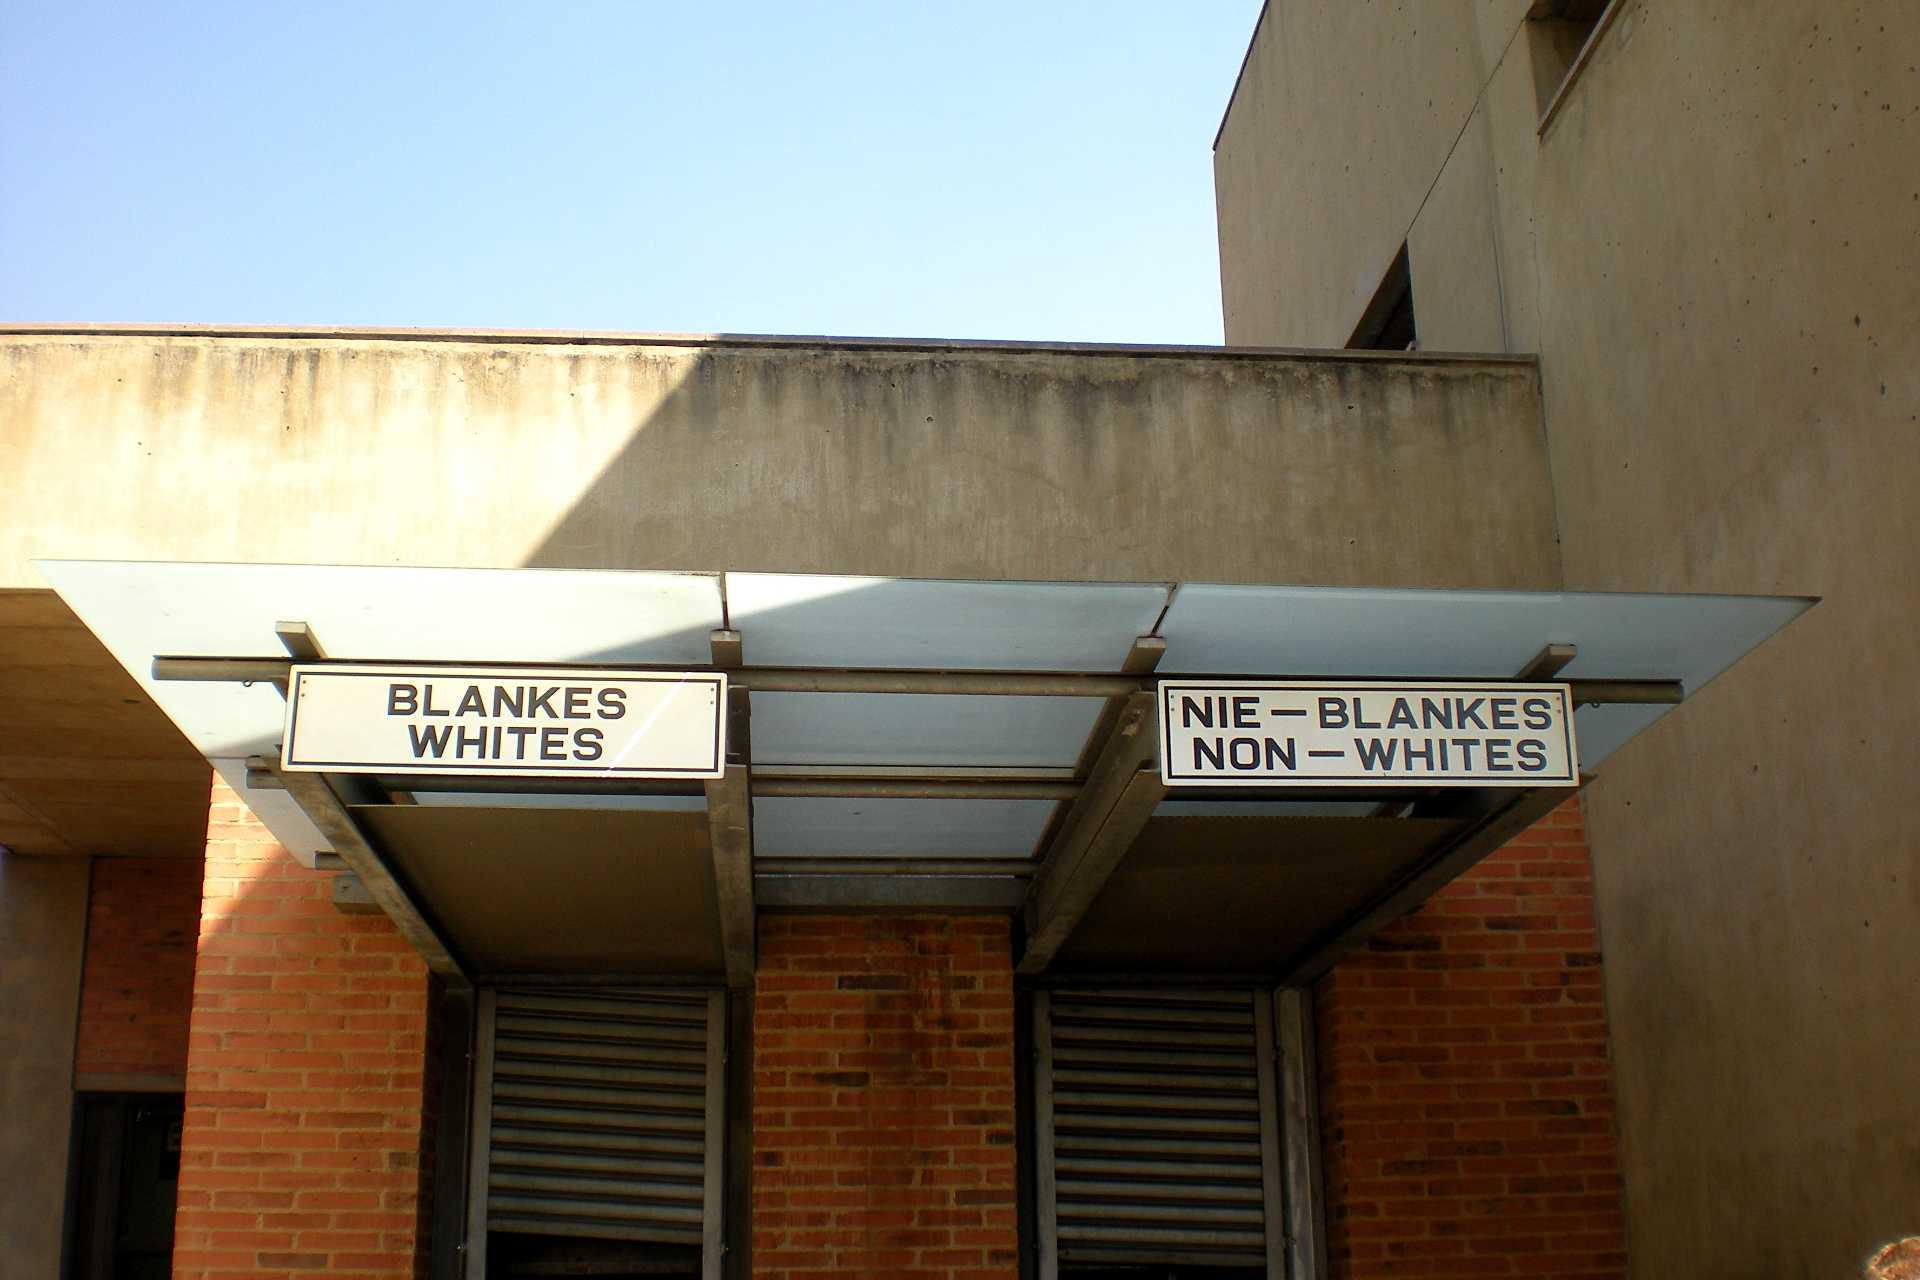 Johannesburg - Musée de l'Apartheid